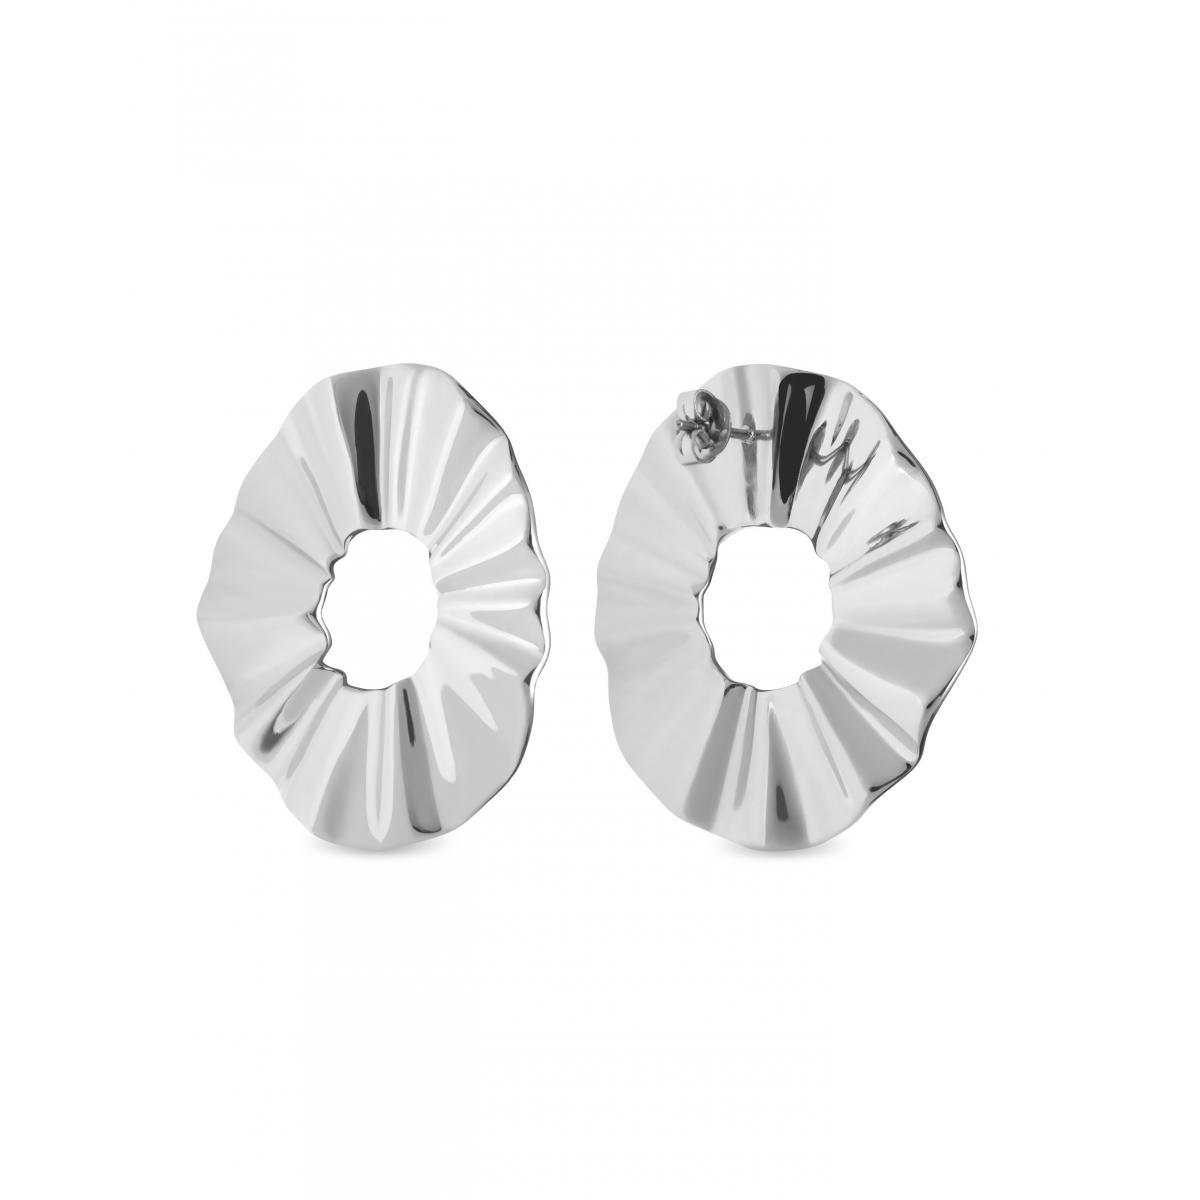 Boucles d'oreilles Rosefield BLWES-J212 Femme